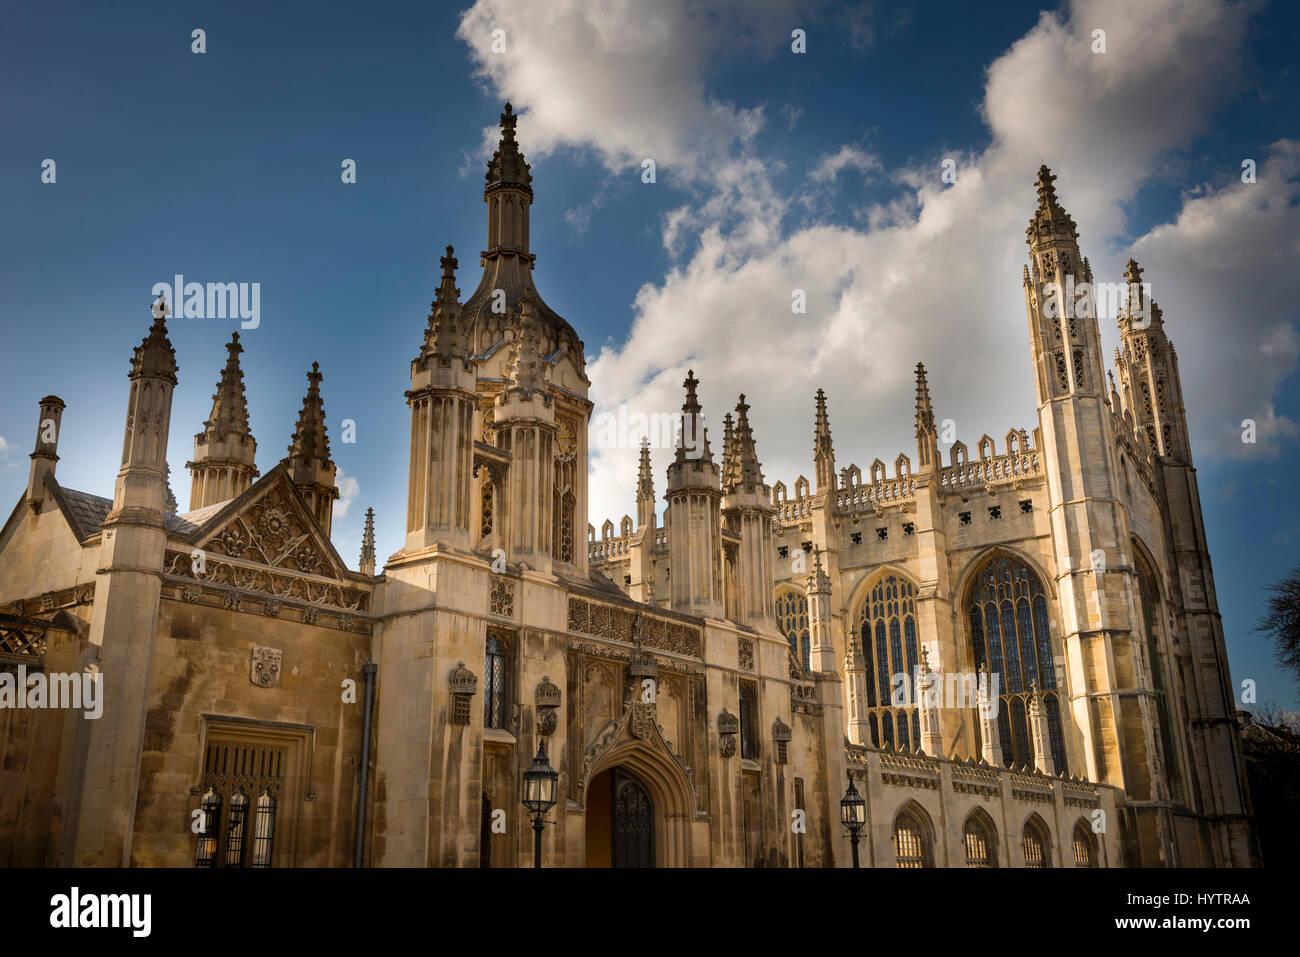 The entrance to Kings College, Cambridge University, England, UK - Stock Image